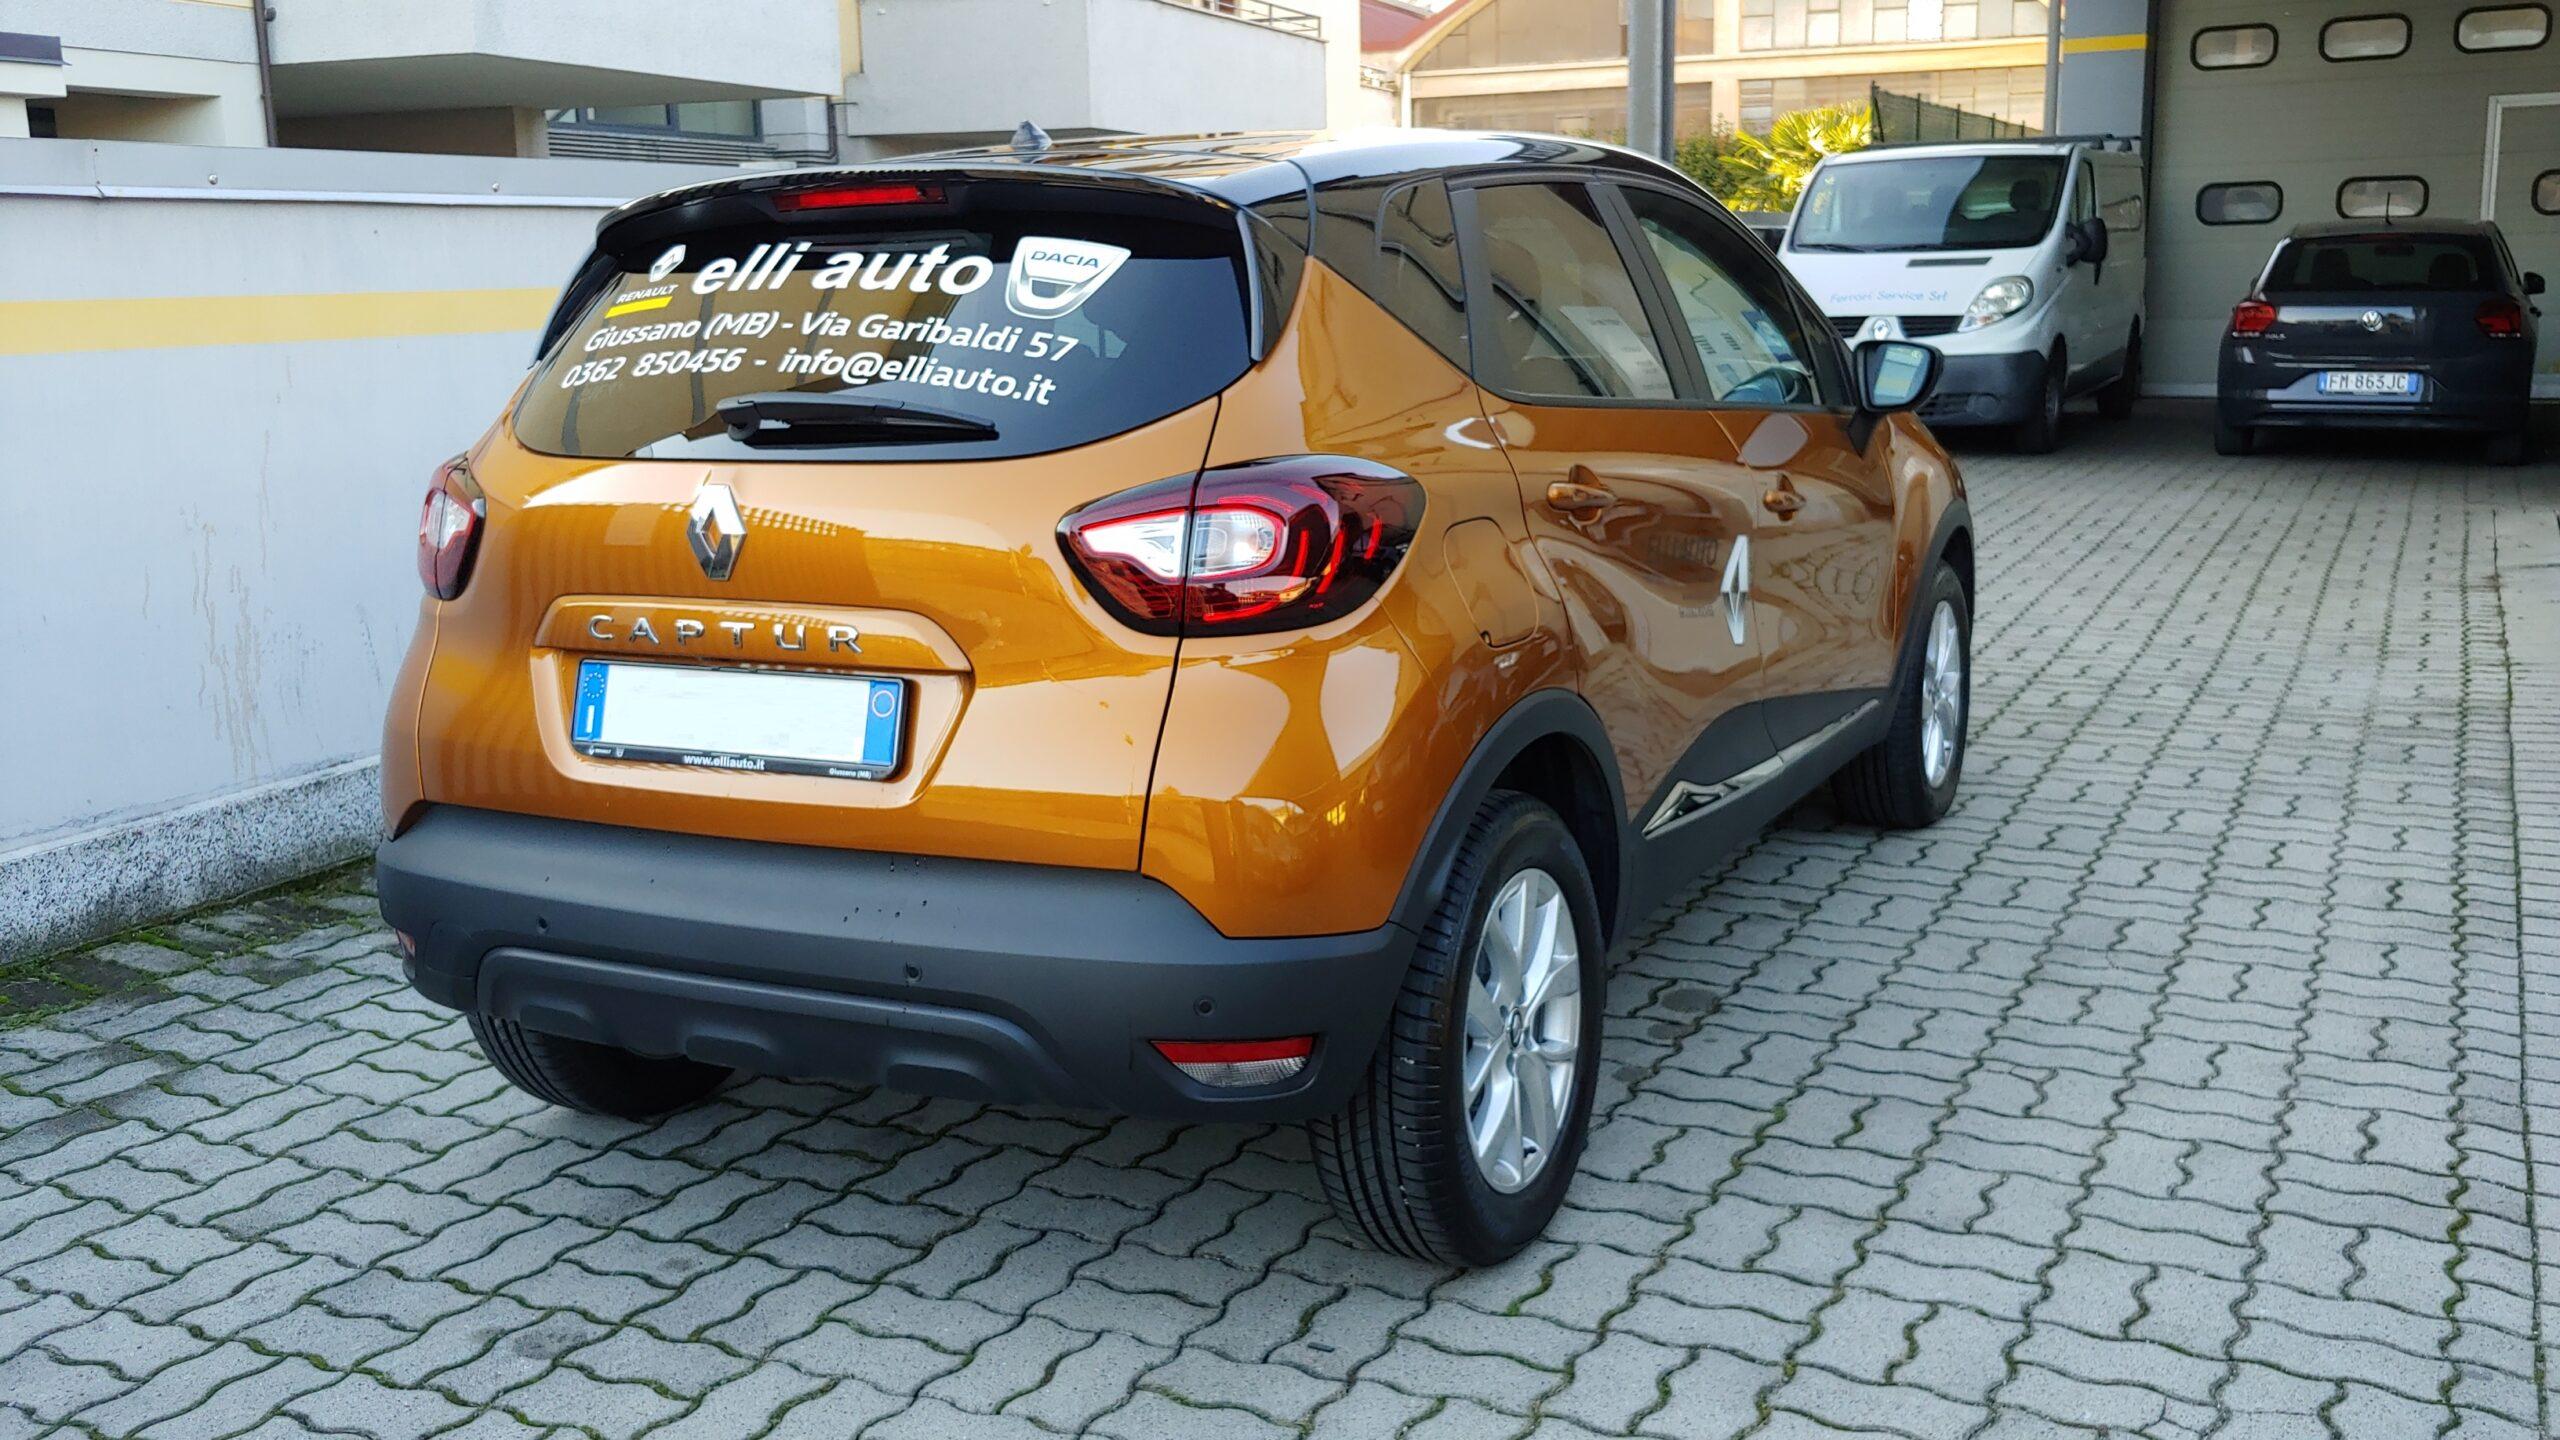 Renault captur sport edition my19 dci 90 cv